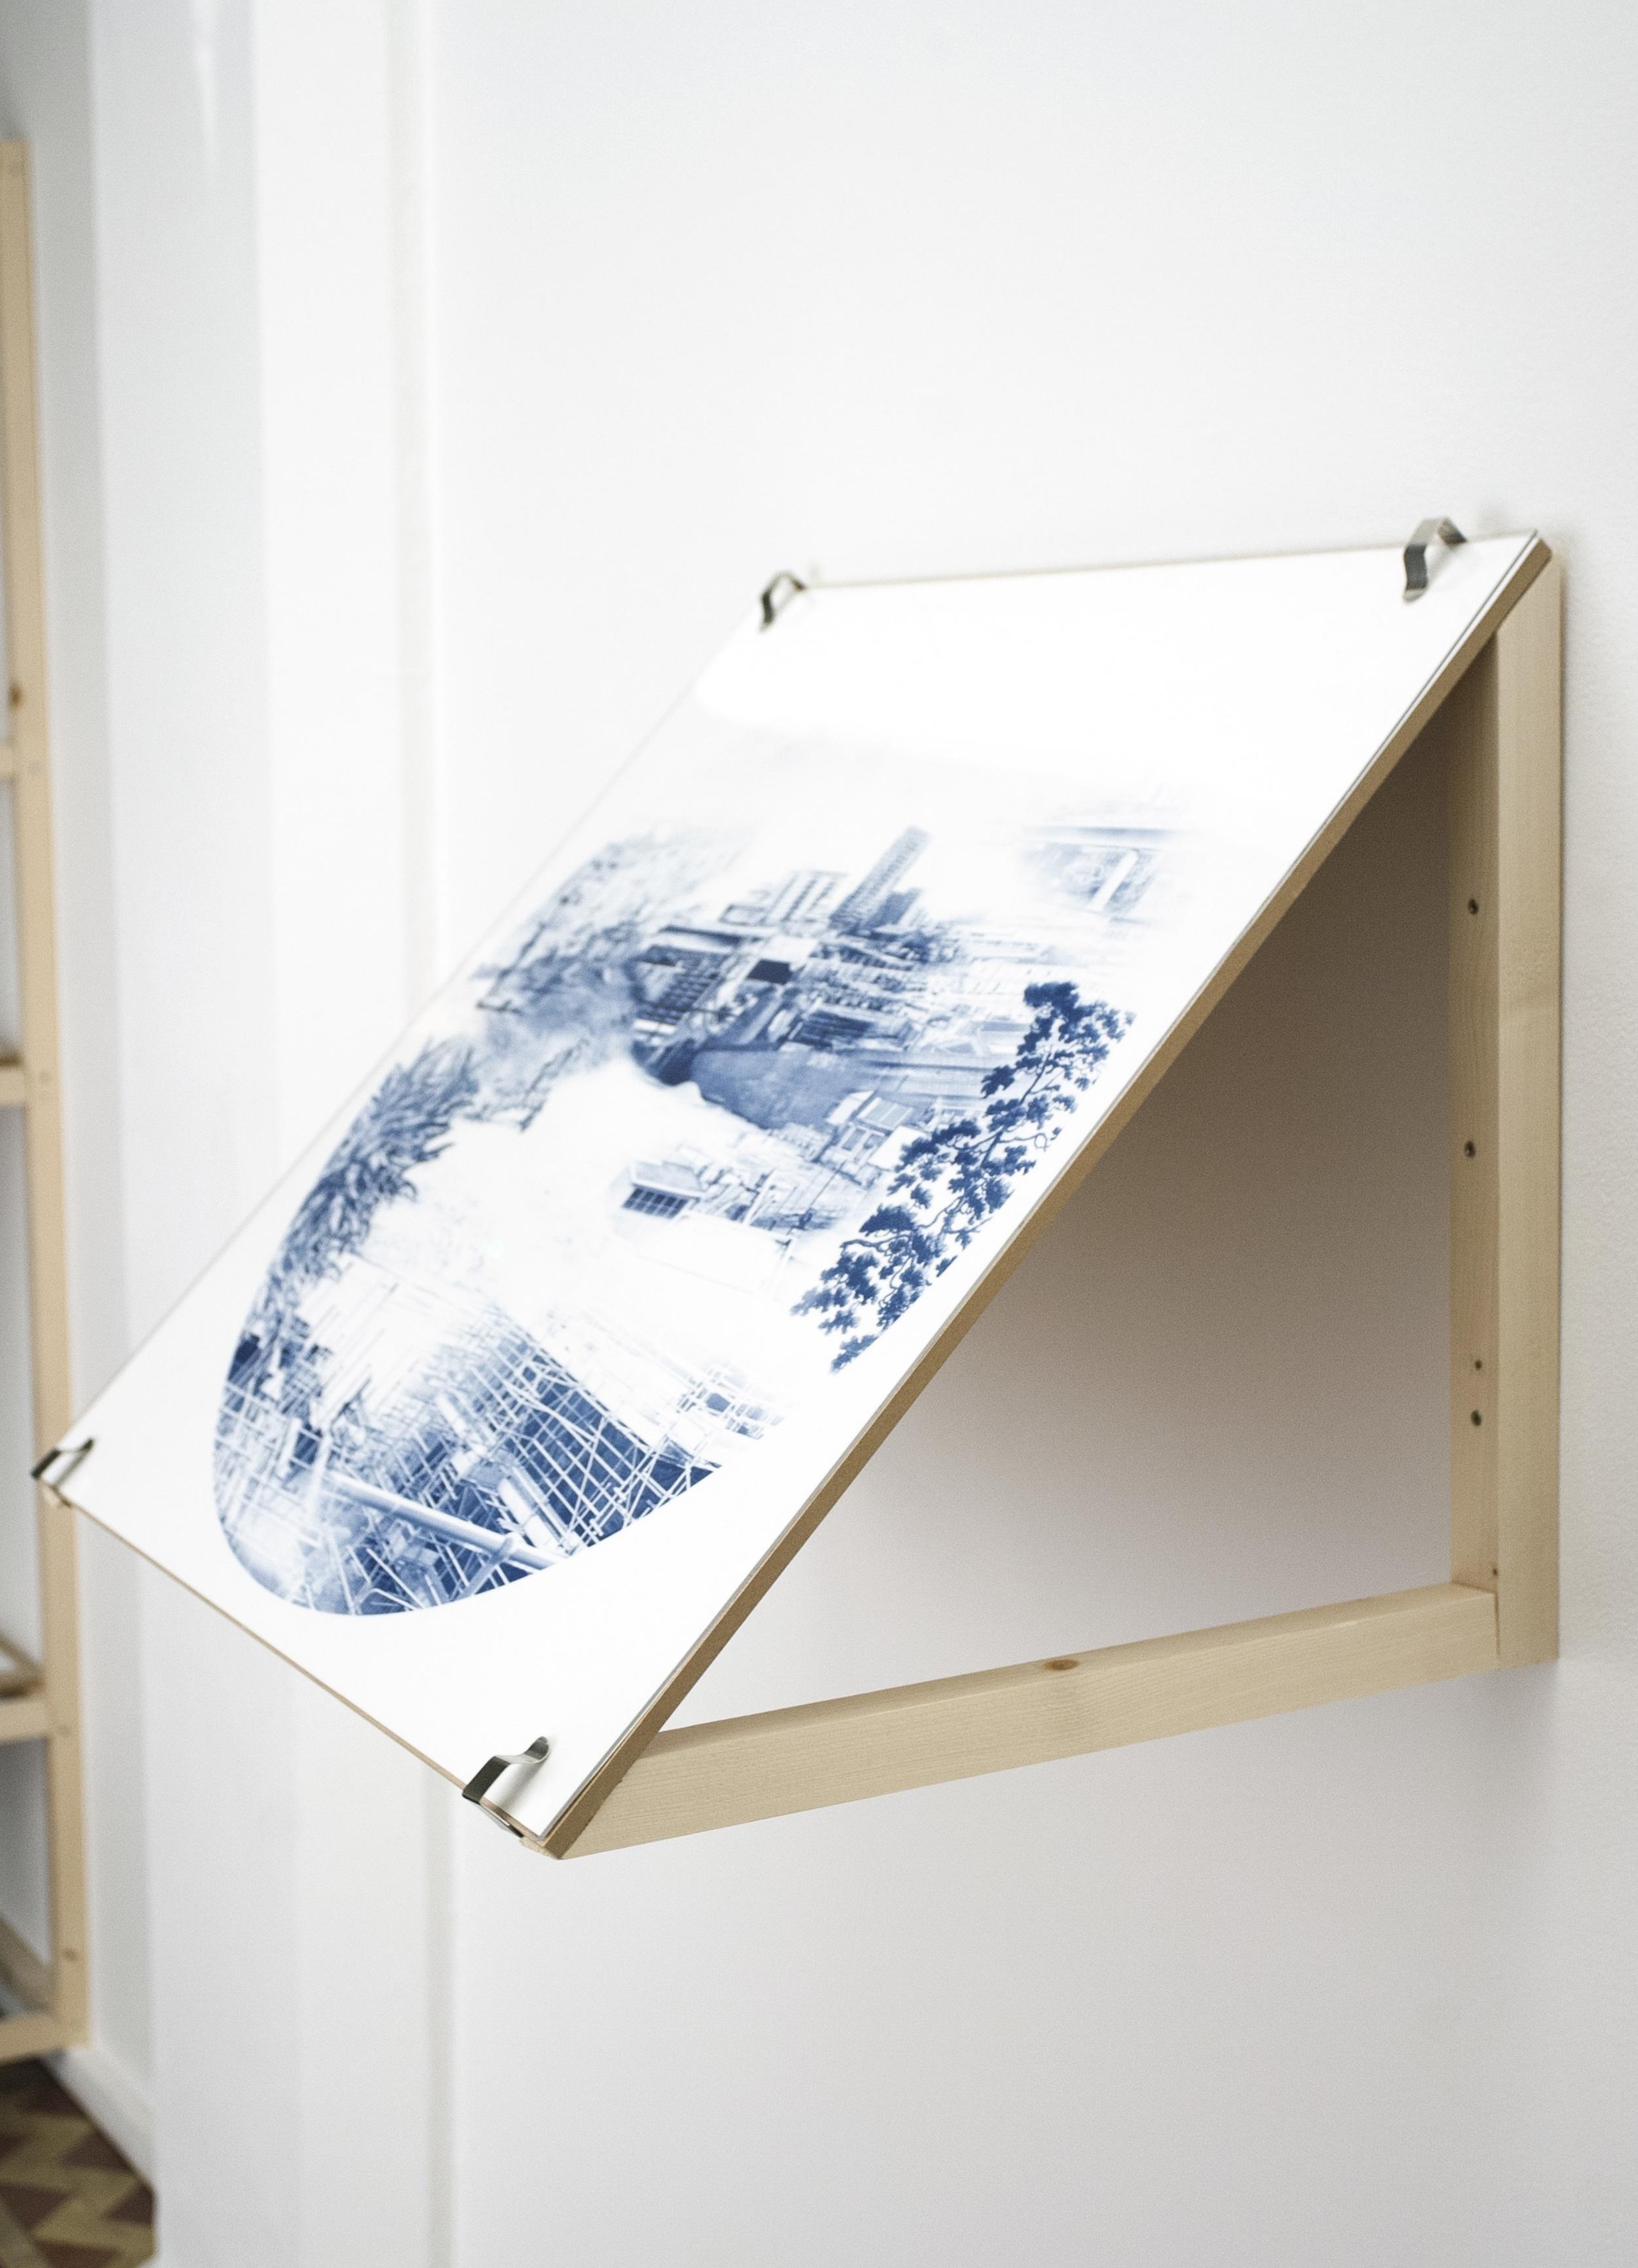 Thomas Frye Court |Cyanotype print